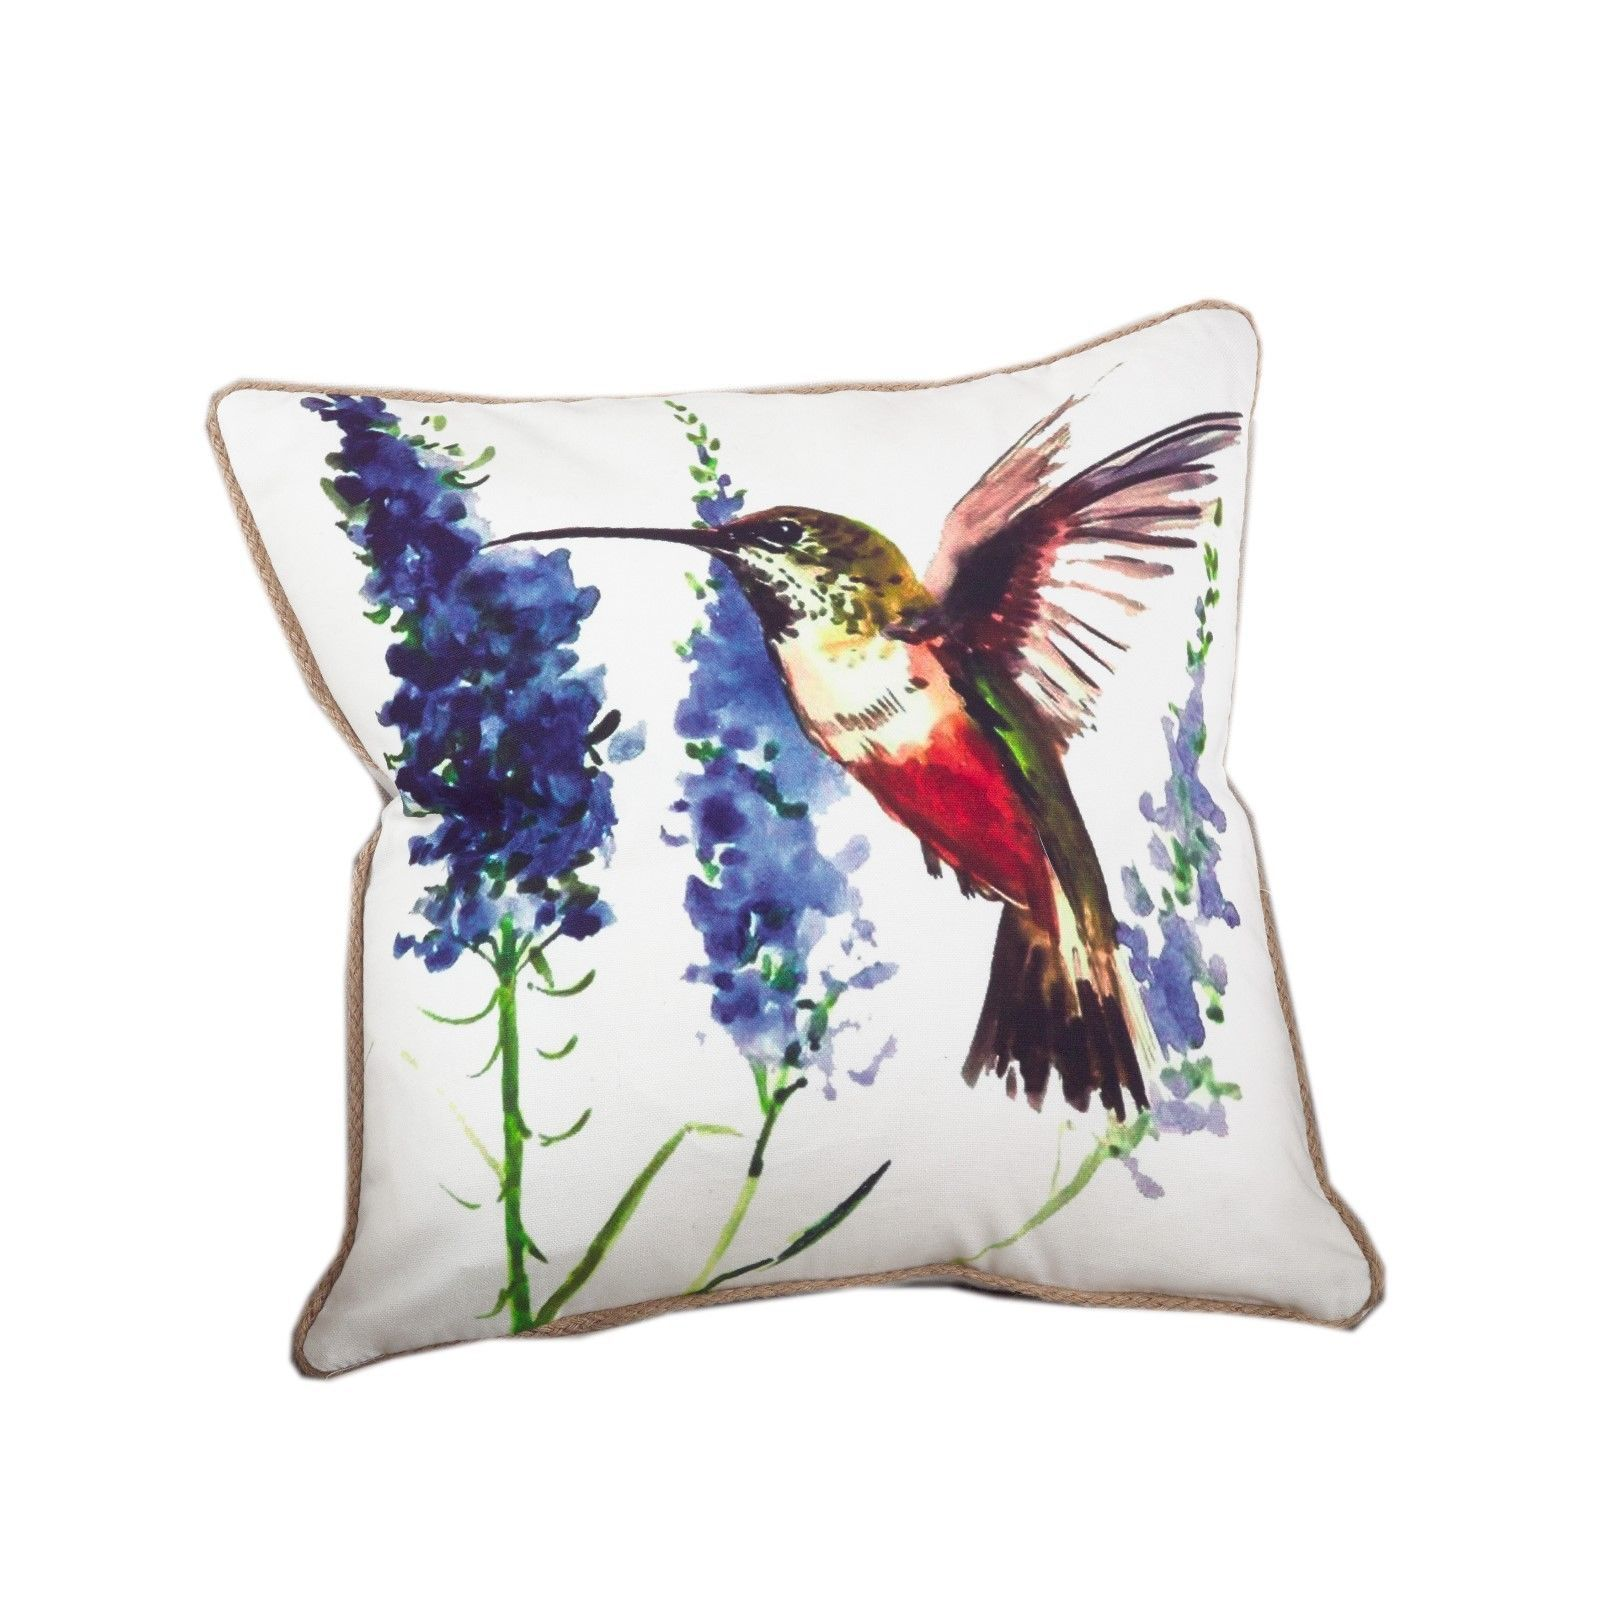 Fennco Styles 18-inch Humming Bird Down Filled Throw Pillow - 100% Cotton - Pillows